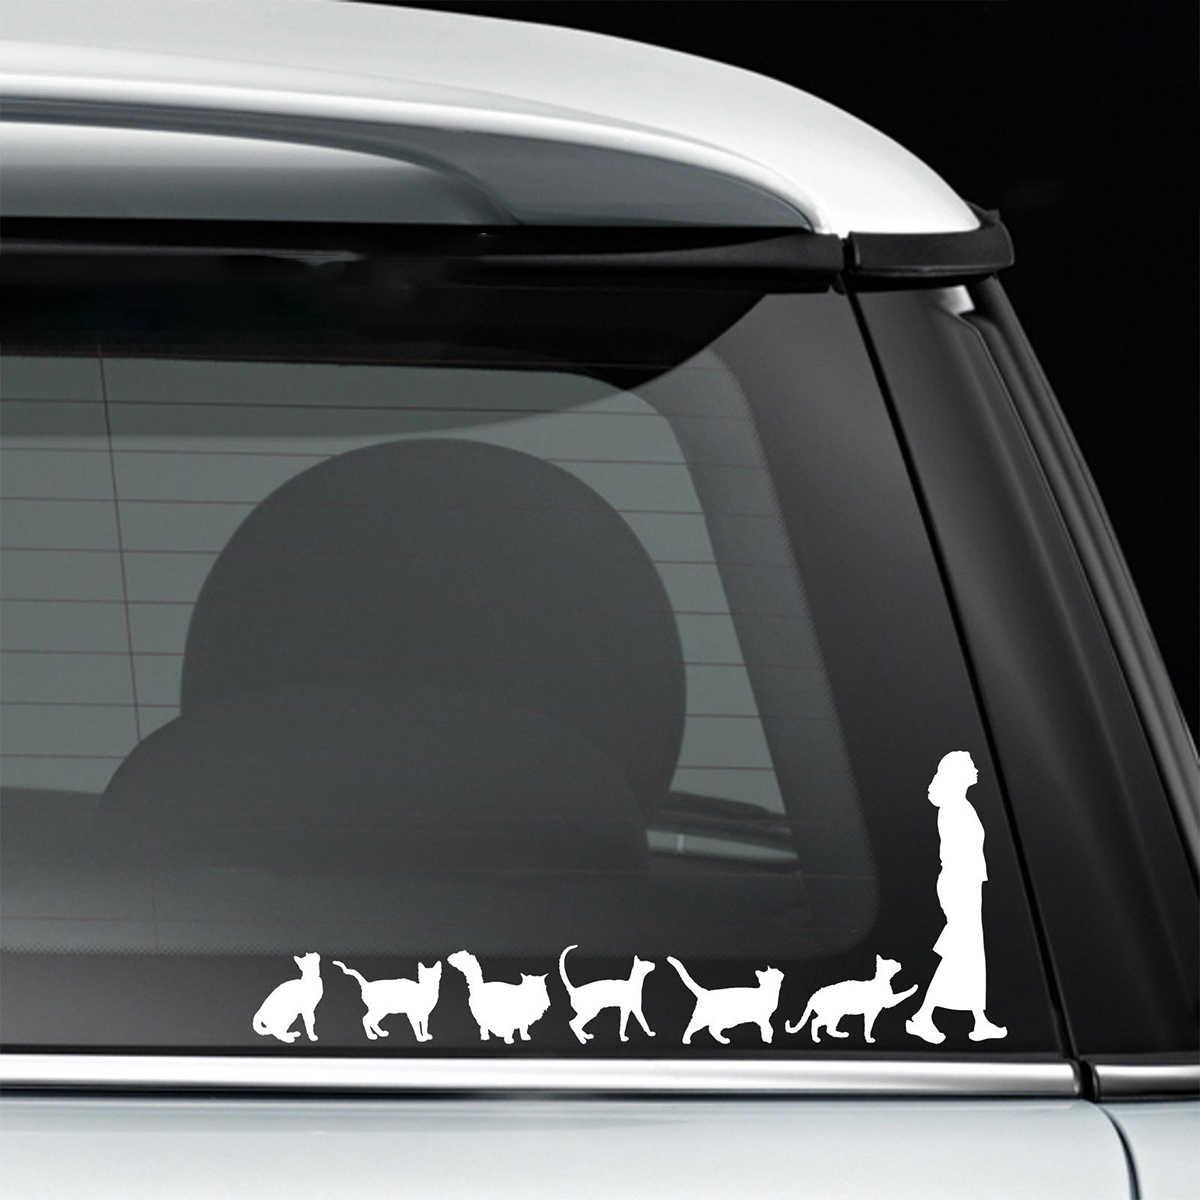 20 7 8cm Cats Crazy Cat Lady Woman Cute Funny Car Window Decal Bumper Sticker Pet Pets Vinyl Car Wrap Decor Decals Car Stickers Aliexpress